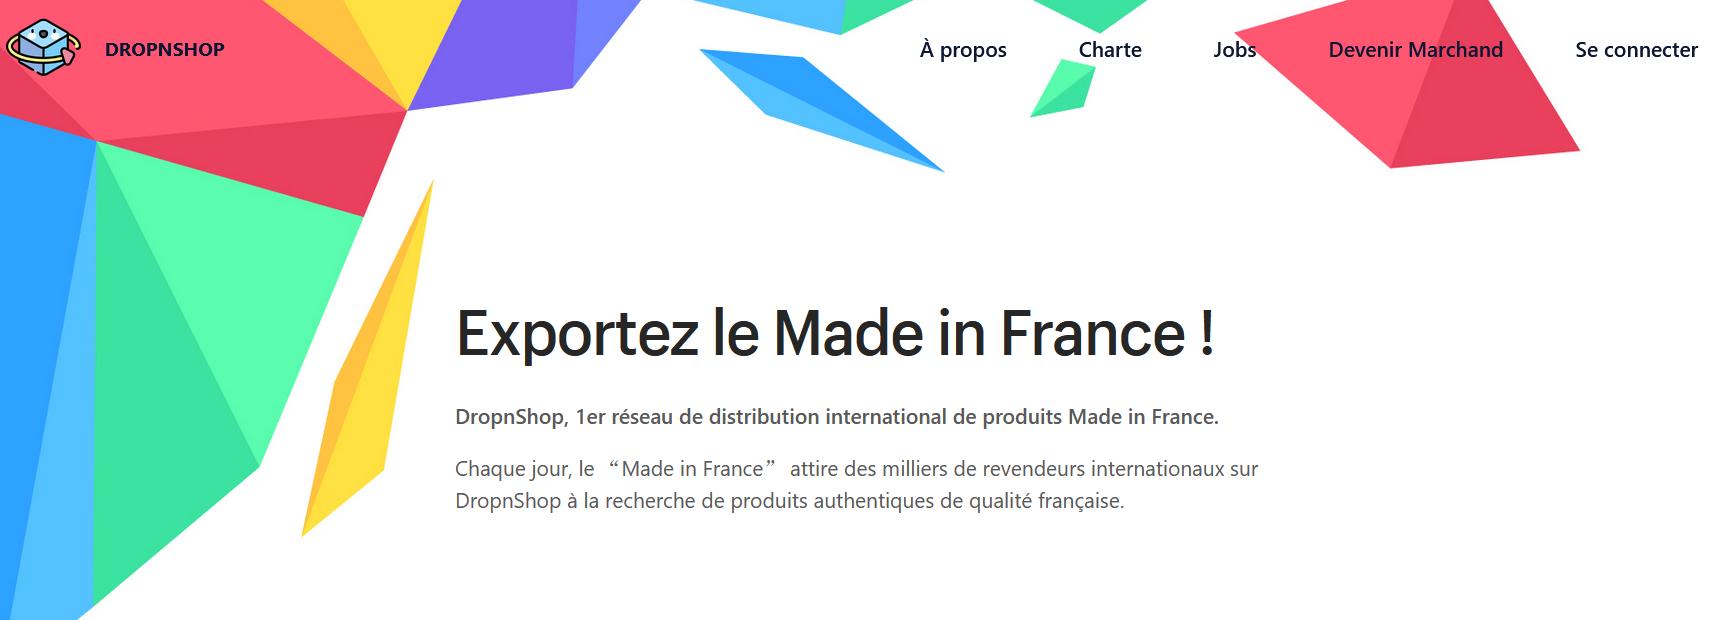 plateforme française dropshipping